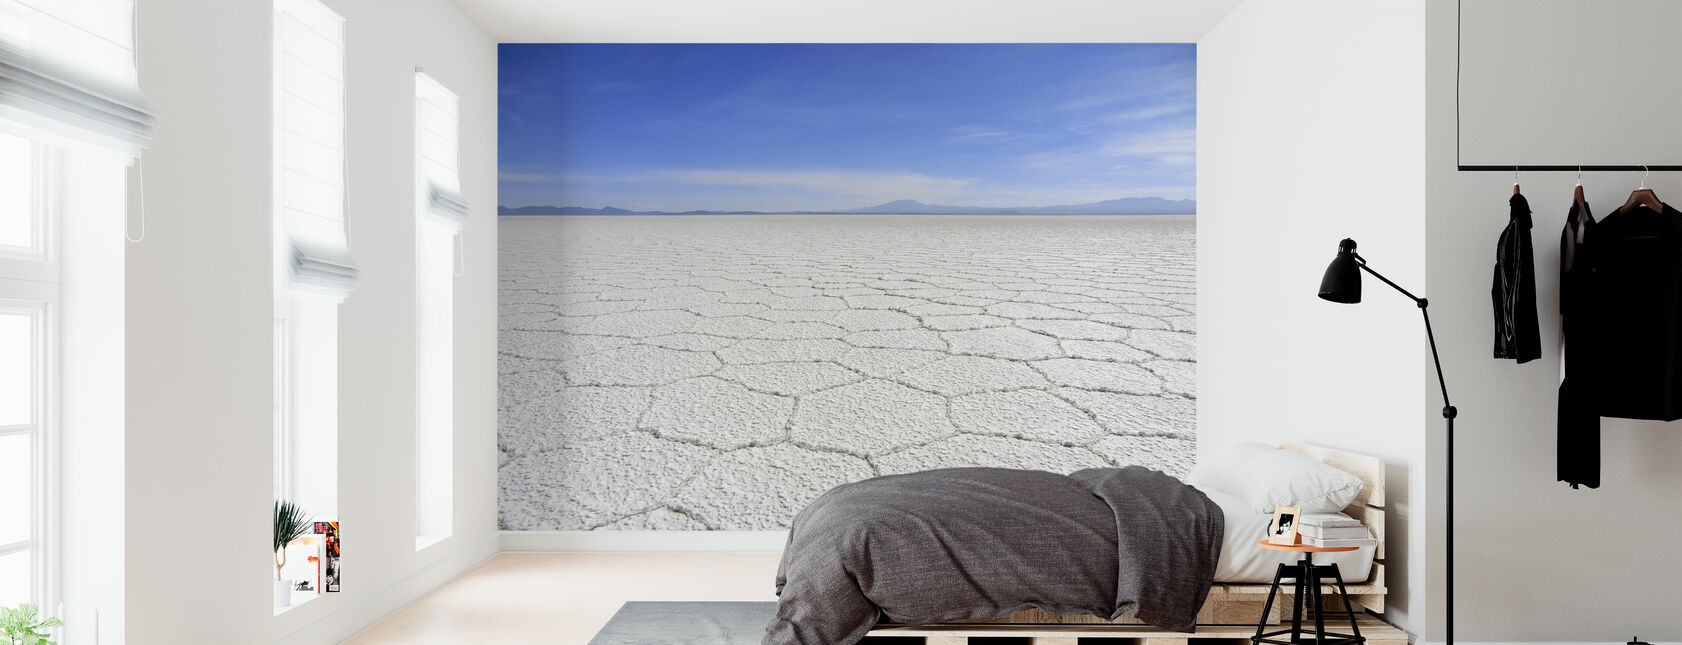 Salt Desert - Wallpaper - Bedroom